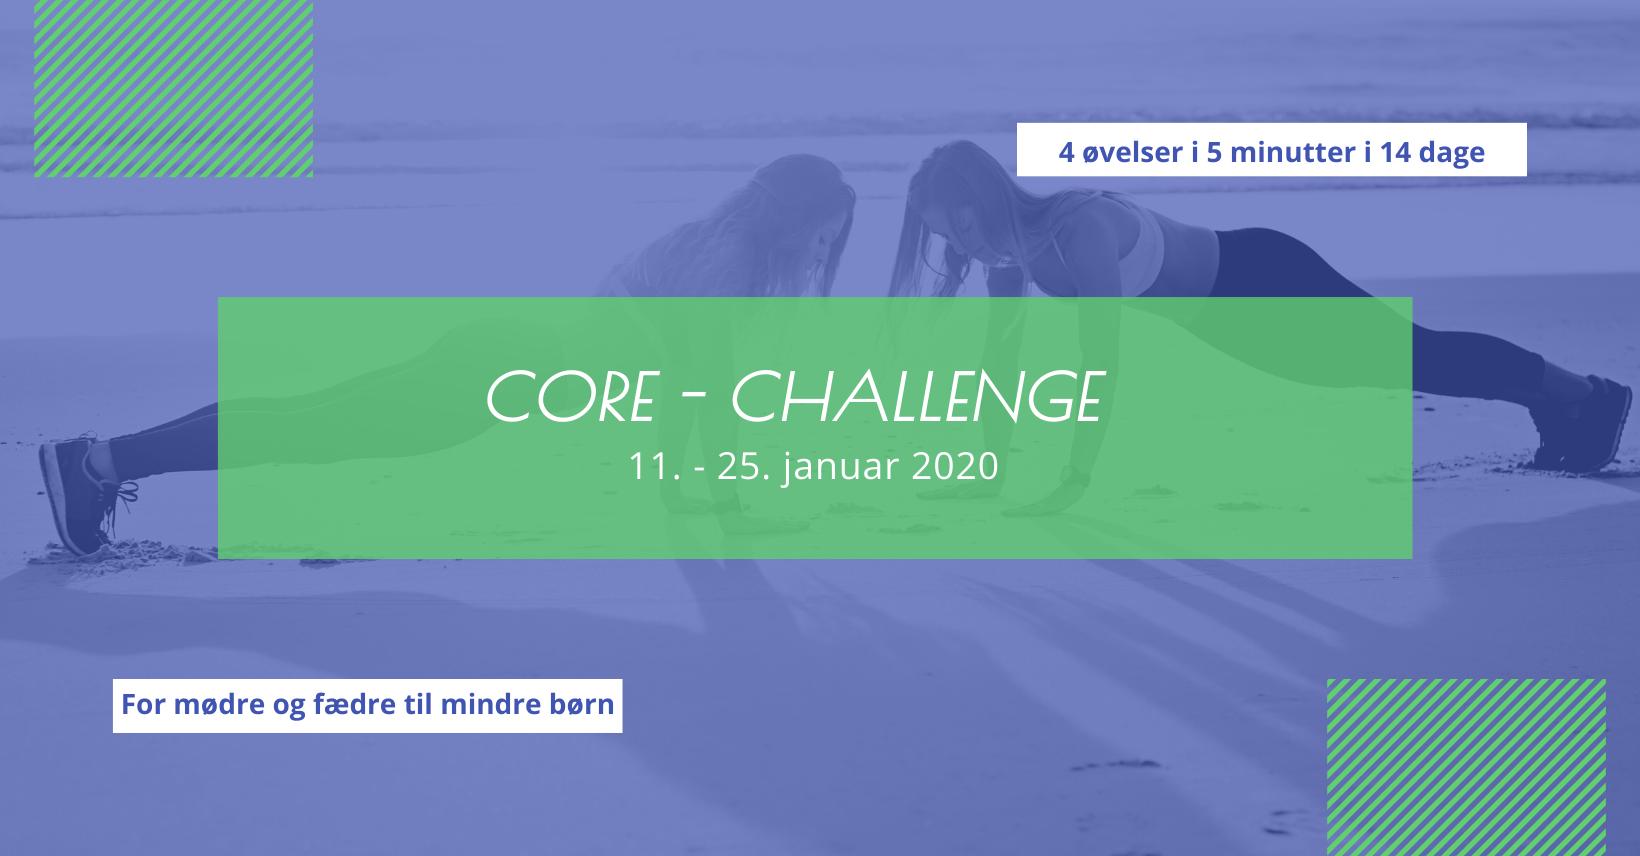 CORE – CHALLENGE 11-25 januar 2020